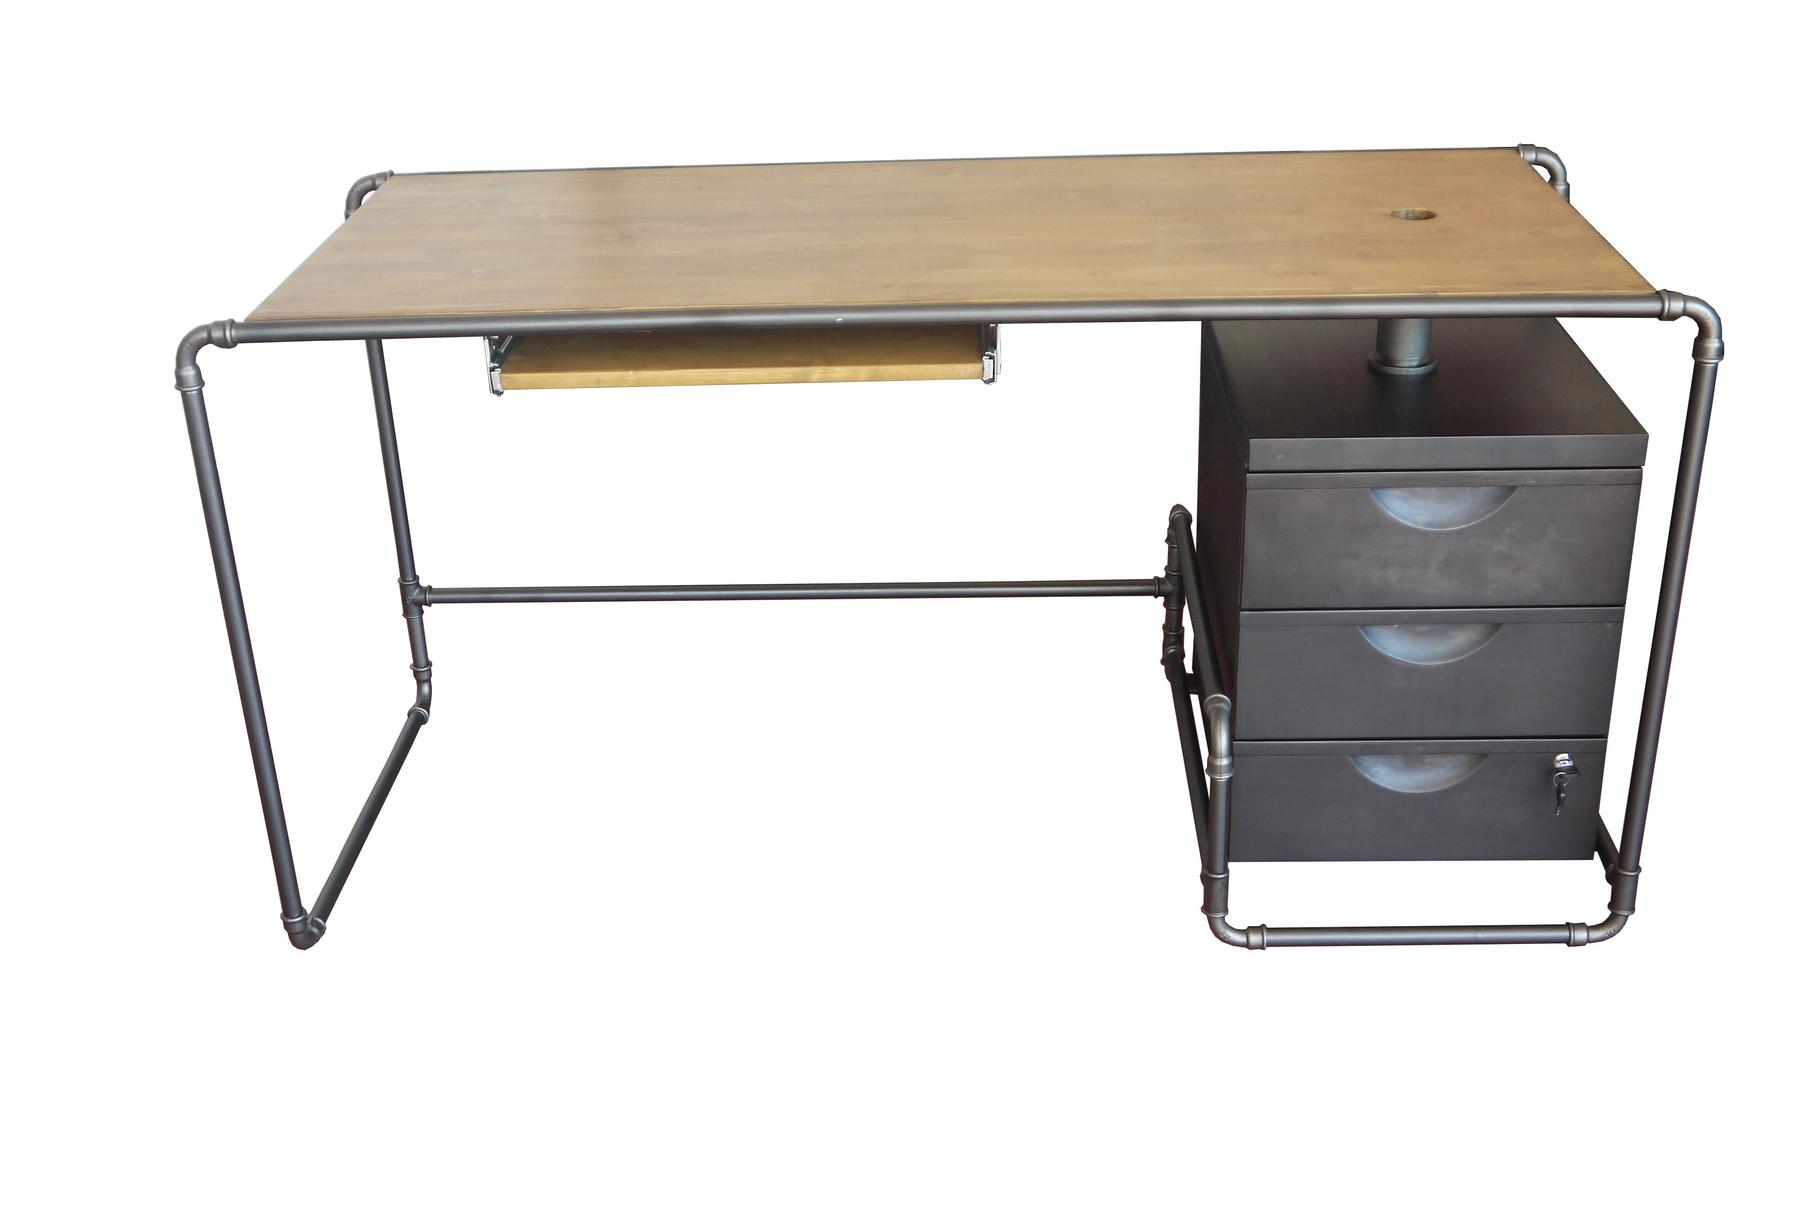 Cr Ation Industrielle Atelier Vintage Mobilier